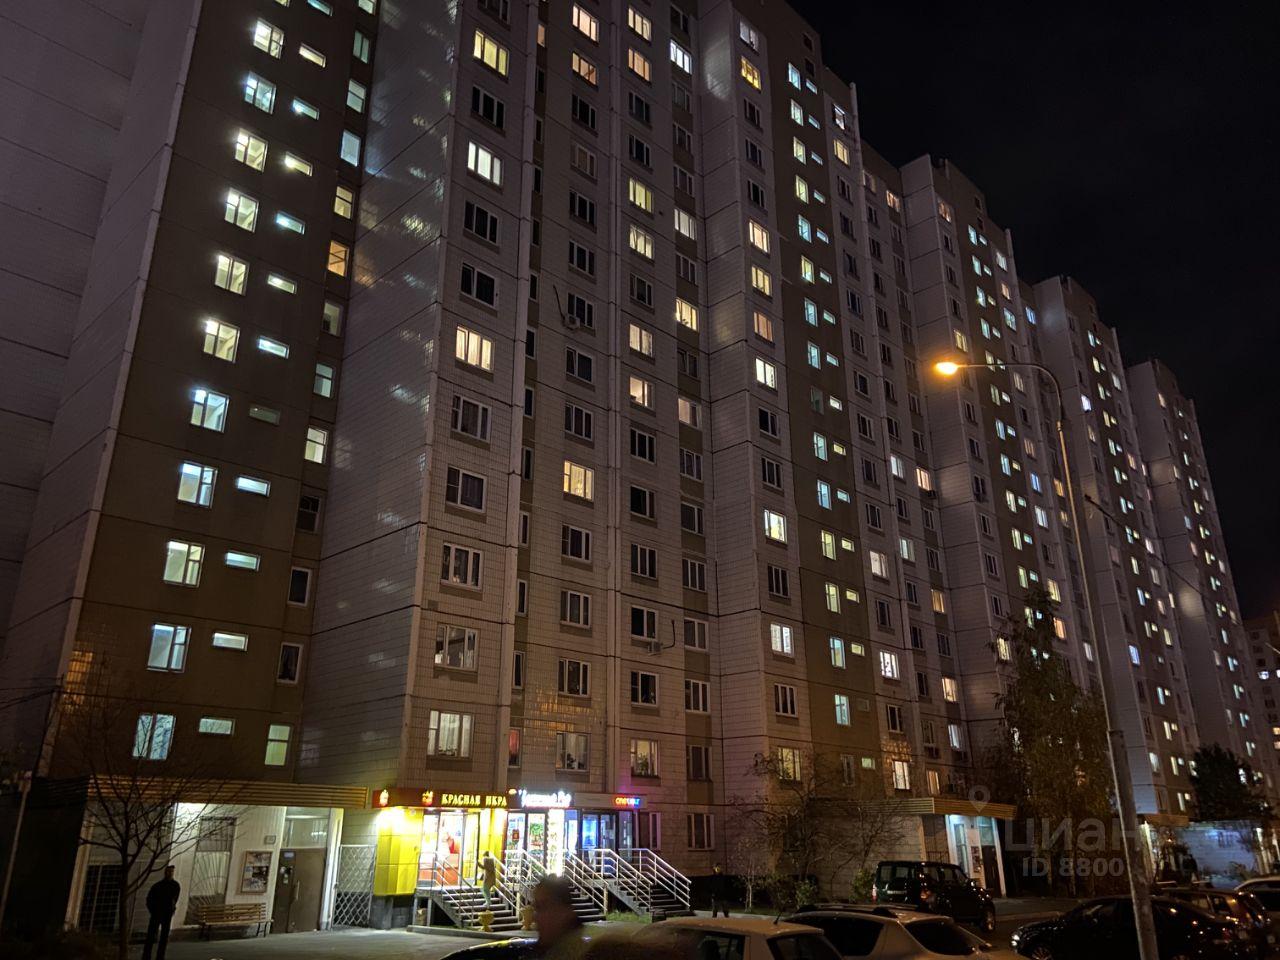 Продаю однокомнатную квартиру 37.6м² Дубравная ул., 35, Москва, СЗАО, р-н Митино м. Митино - база ЦИАН, объявление 253111640